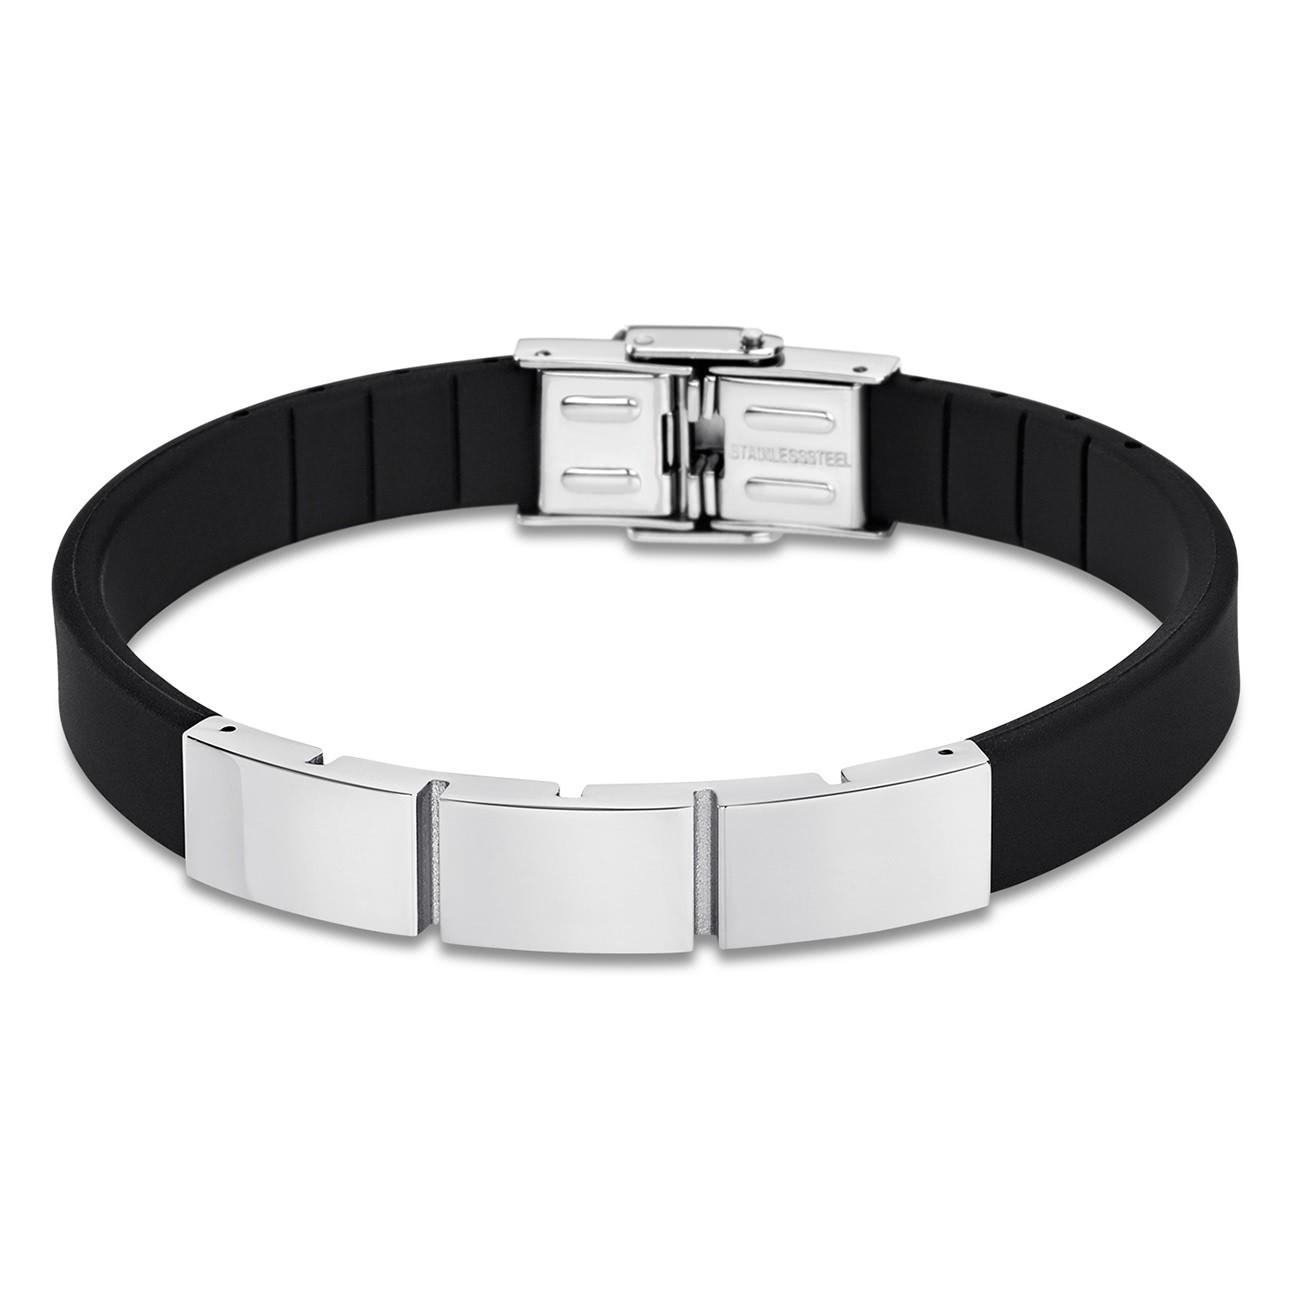 LOTUS Style Armband Herren LS1796-2/1 Edelstahl schwarz silber JLS1796-2-1